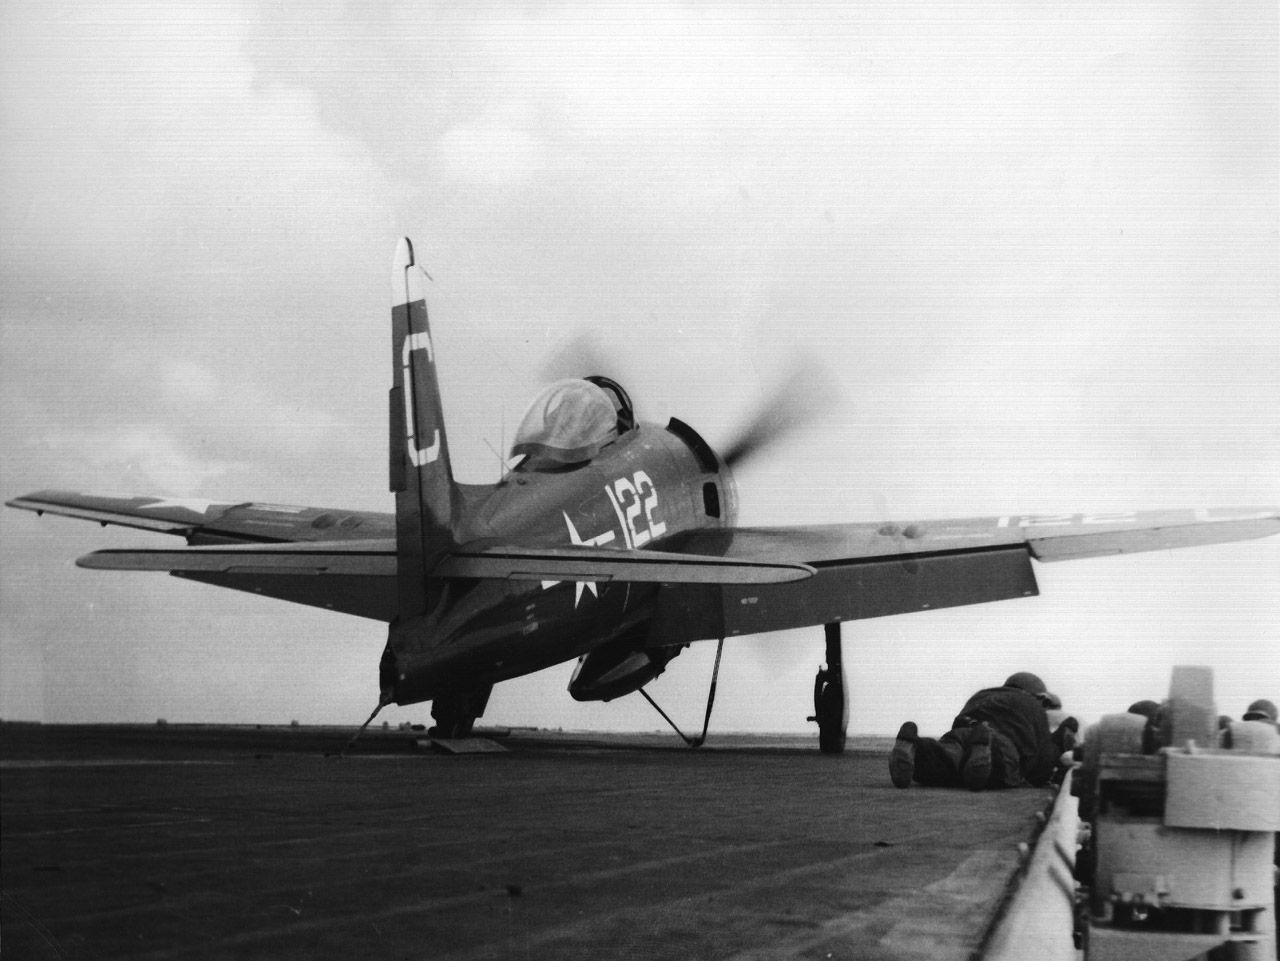 F8F Bearcat on catapult ready for takeoff. | ぷろぺら | Pinterest